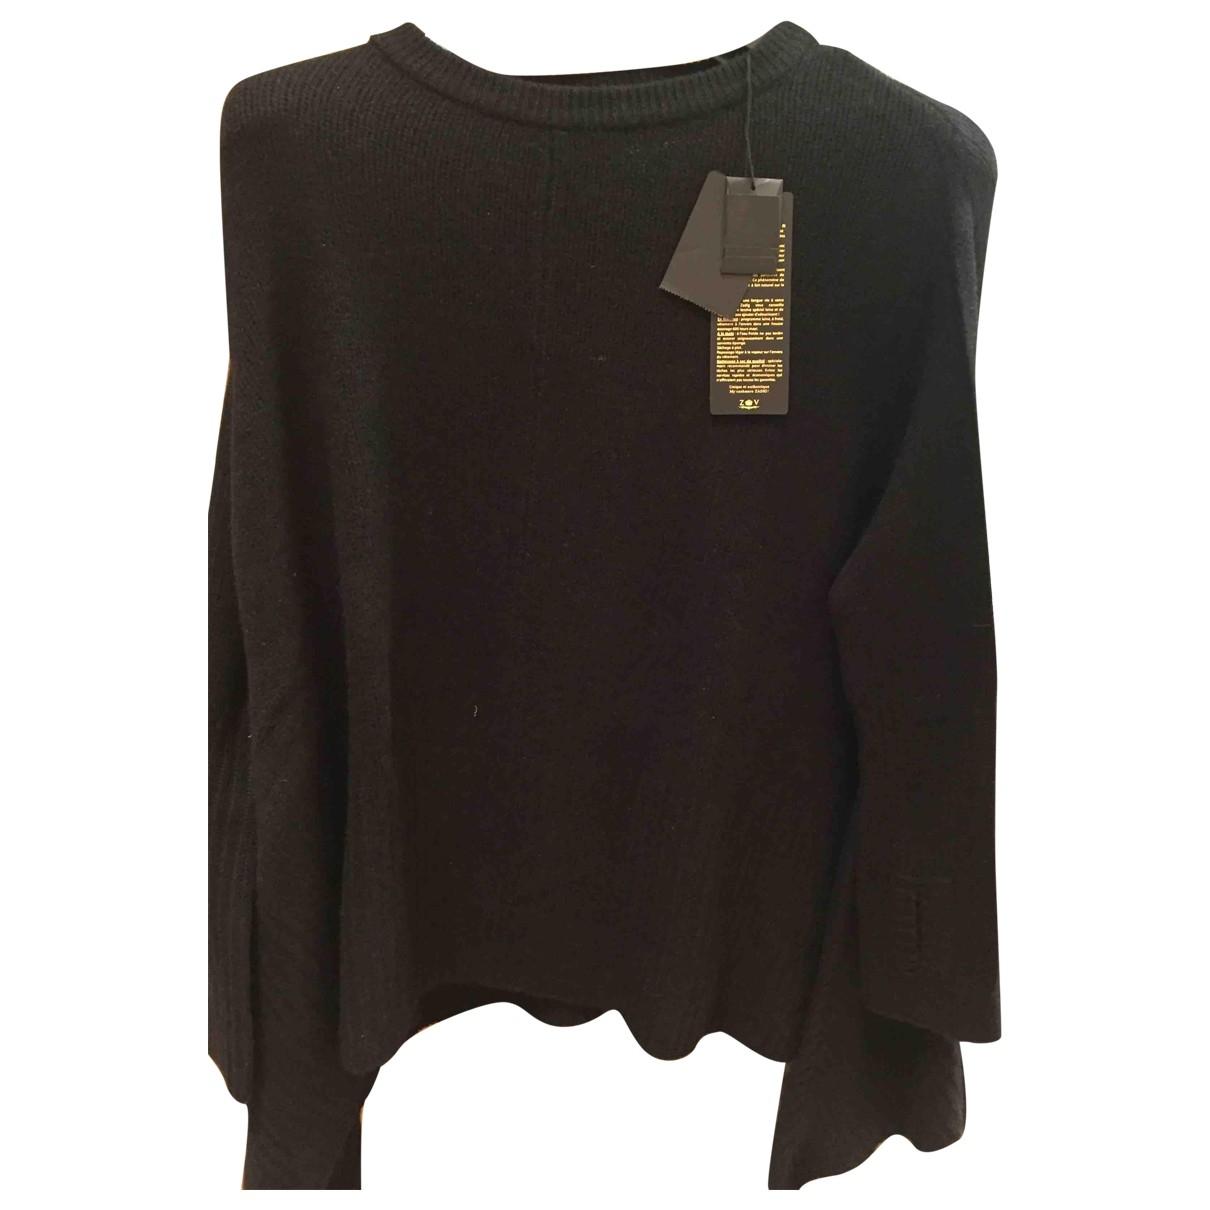 Zadig & Voltaire \N Black Cashmere Knitwear for Women S International